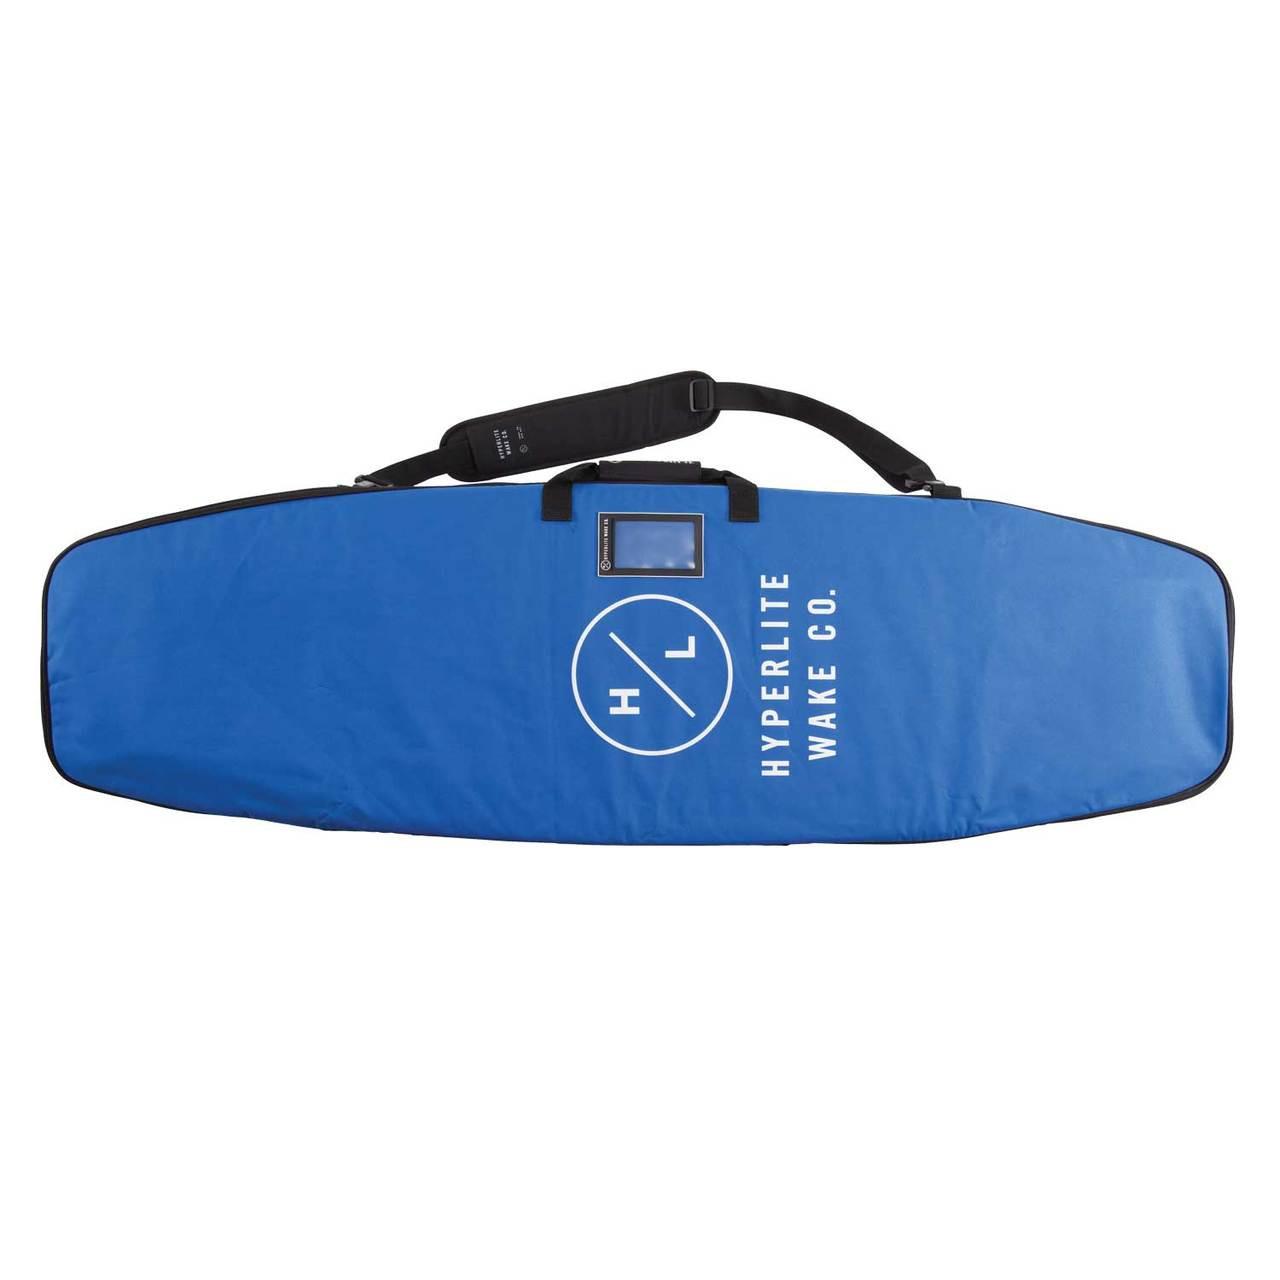 Wakeboard Boardbag Tasche HYPERLITE ESSENTIAL Boardbag 2019 mint Boardbag